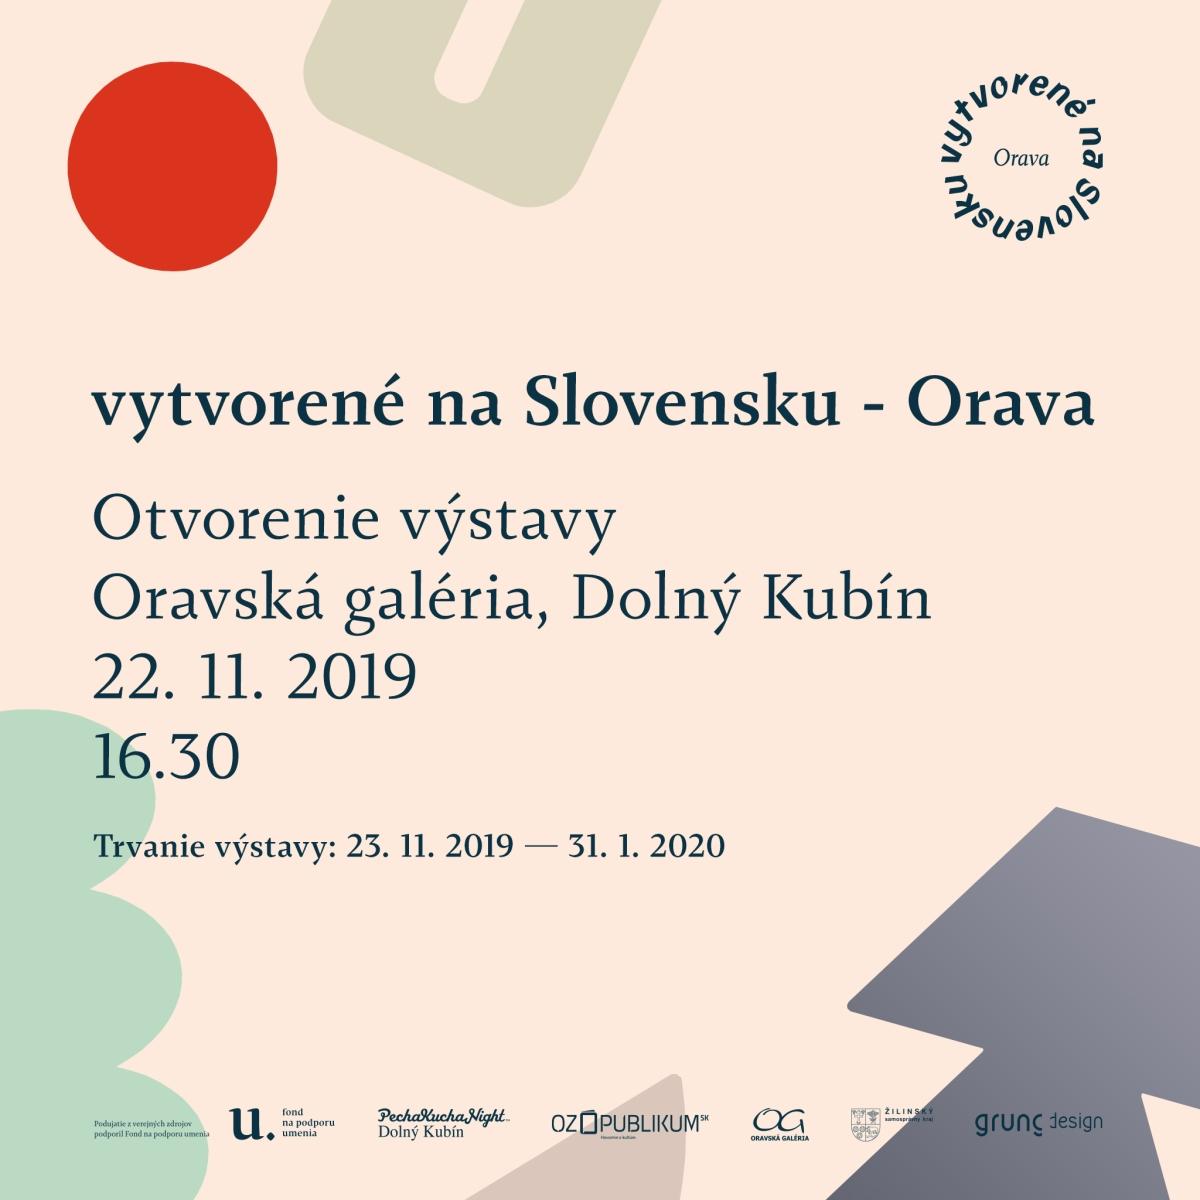 srbskej datovania kultúry